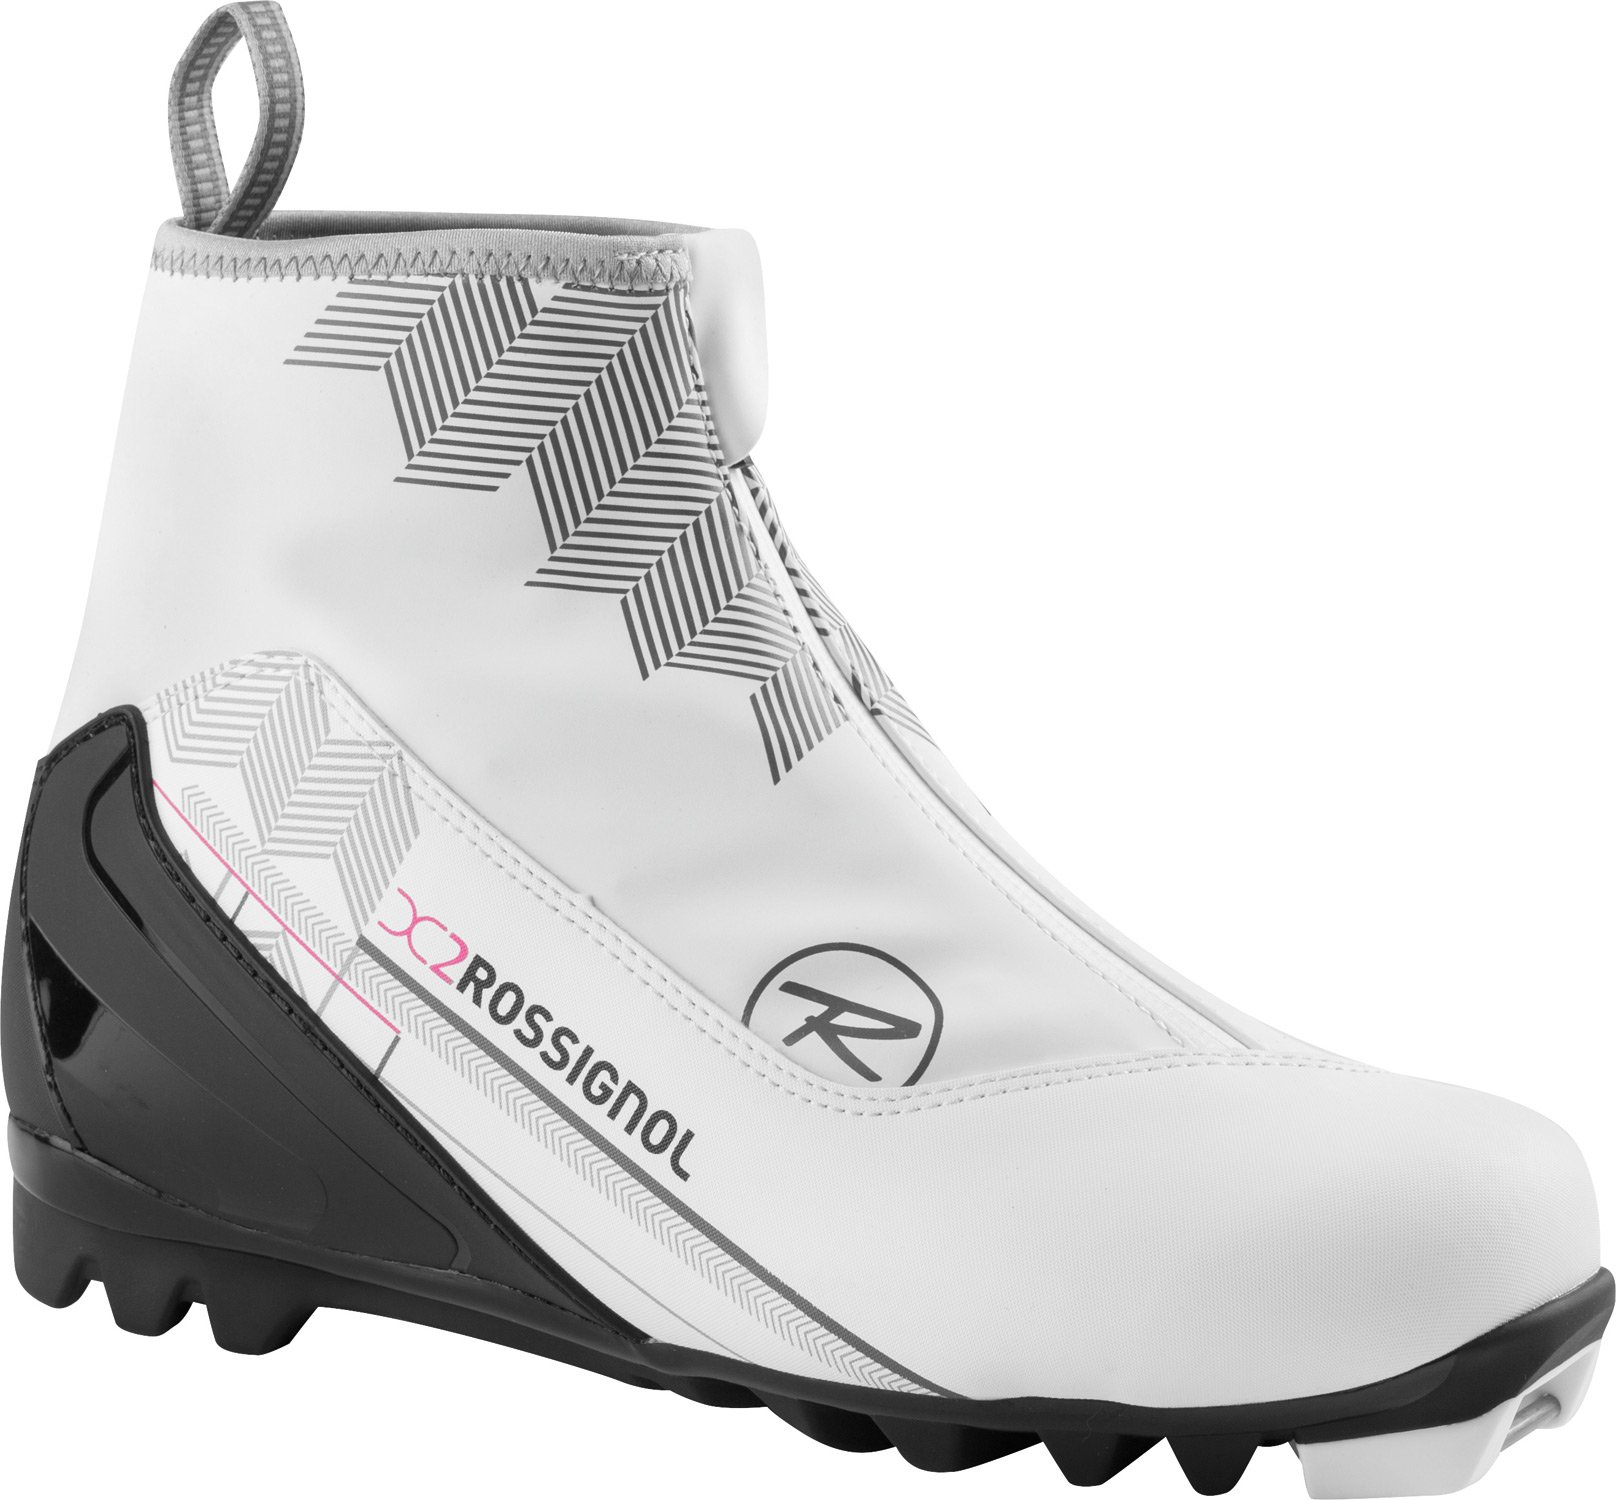 Rossignol X 2 FW XC Ski Boots Womens